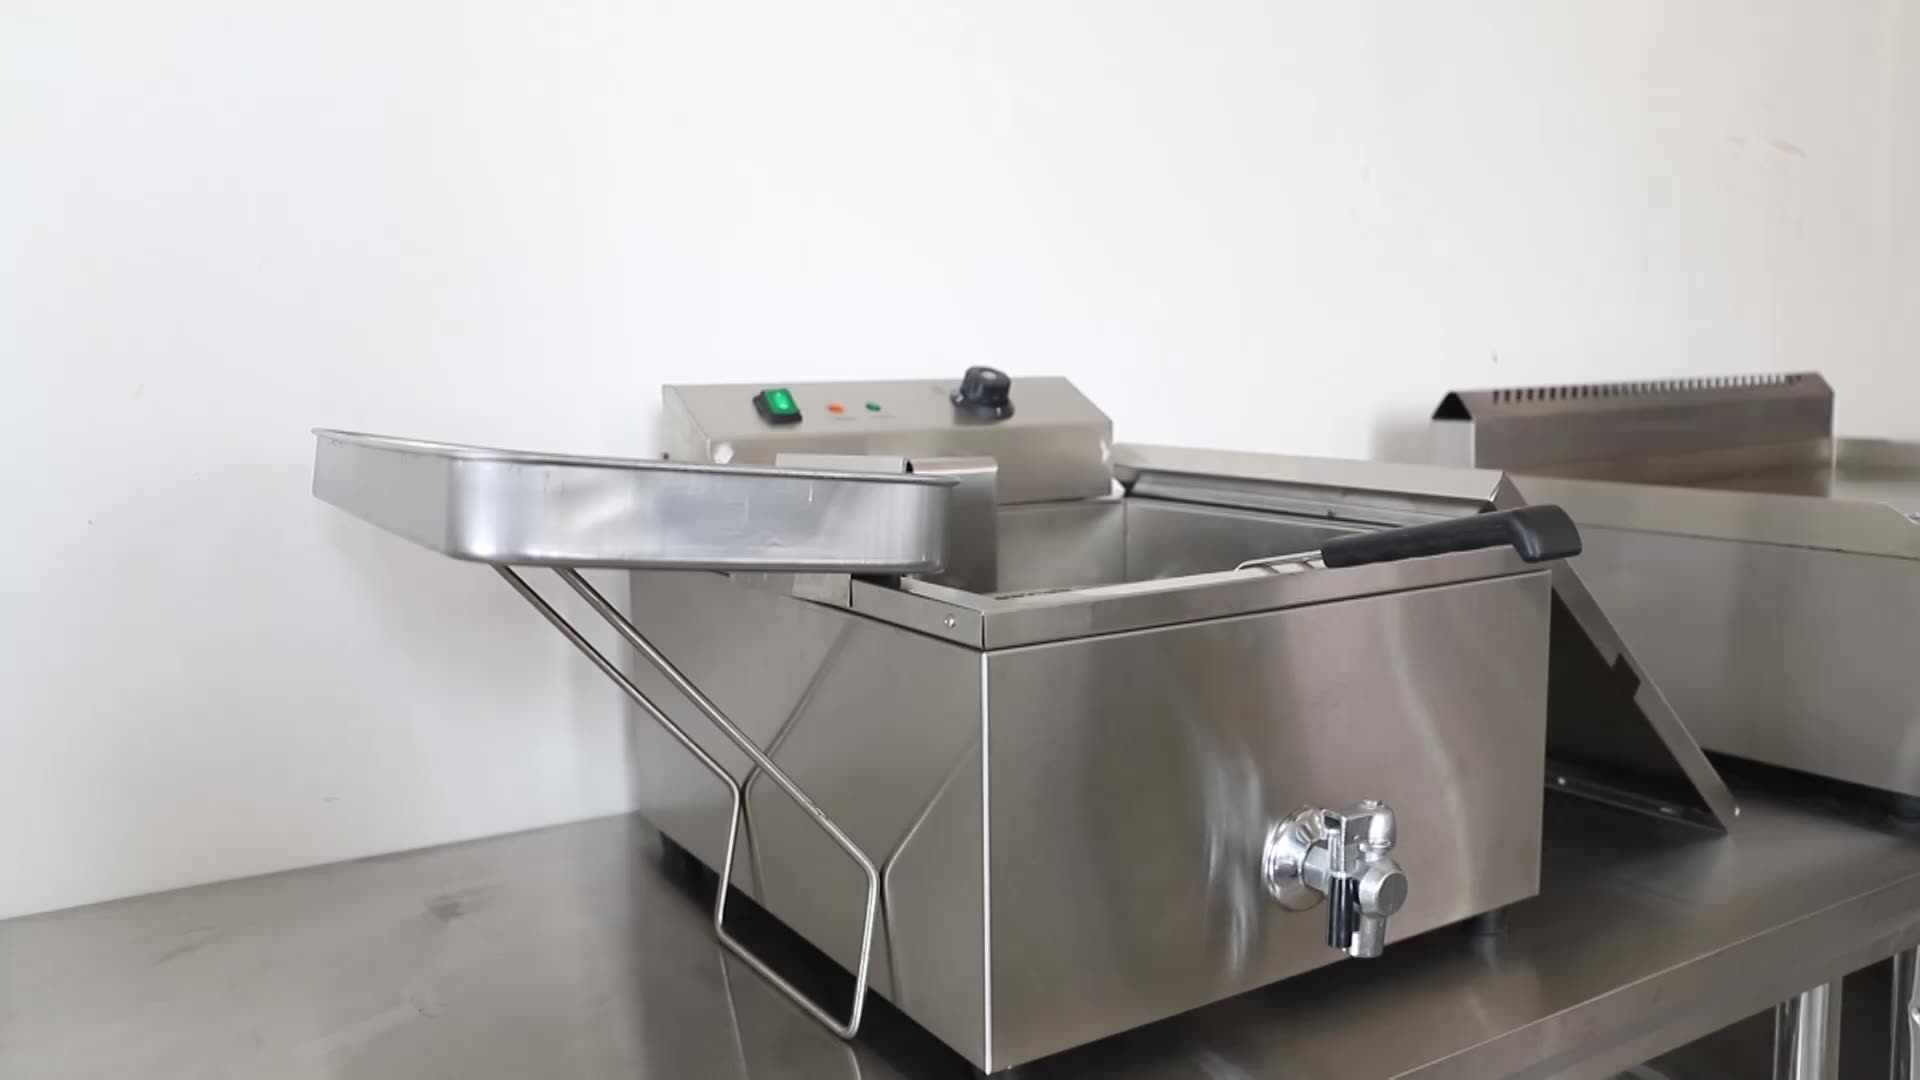 Professional Kitchen Equipment Deep Electric Chicken Fryer Of CHINZAO Brand